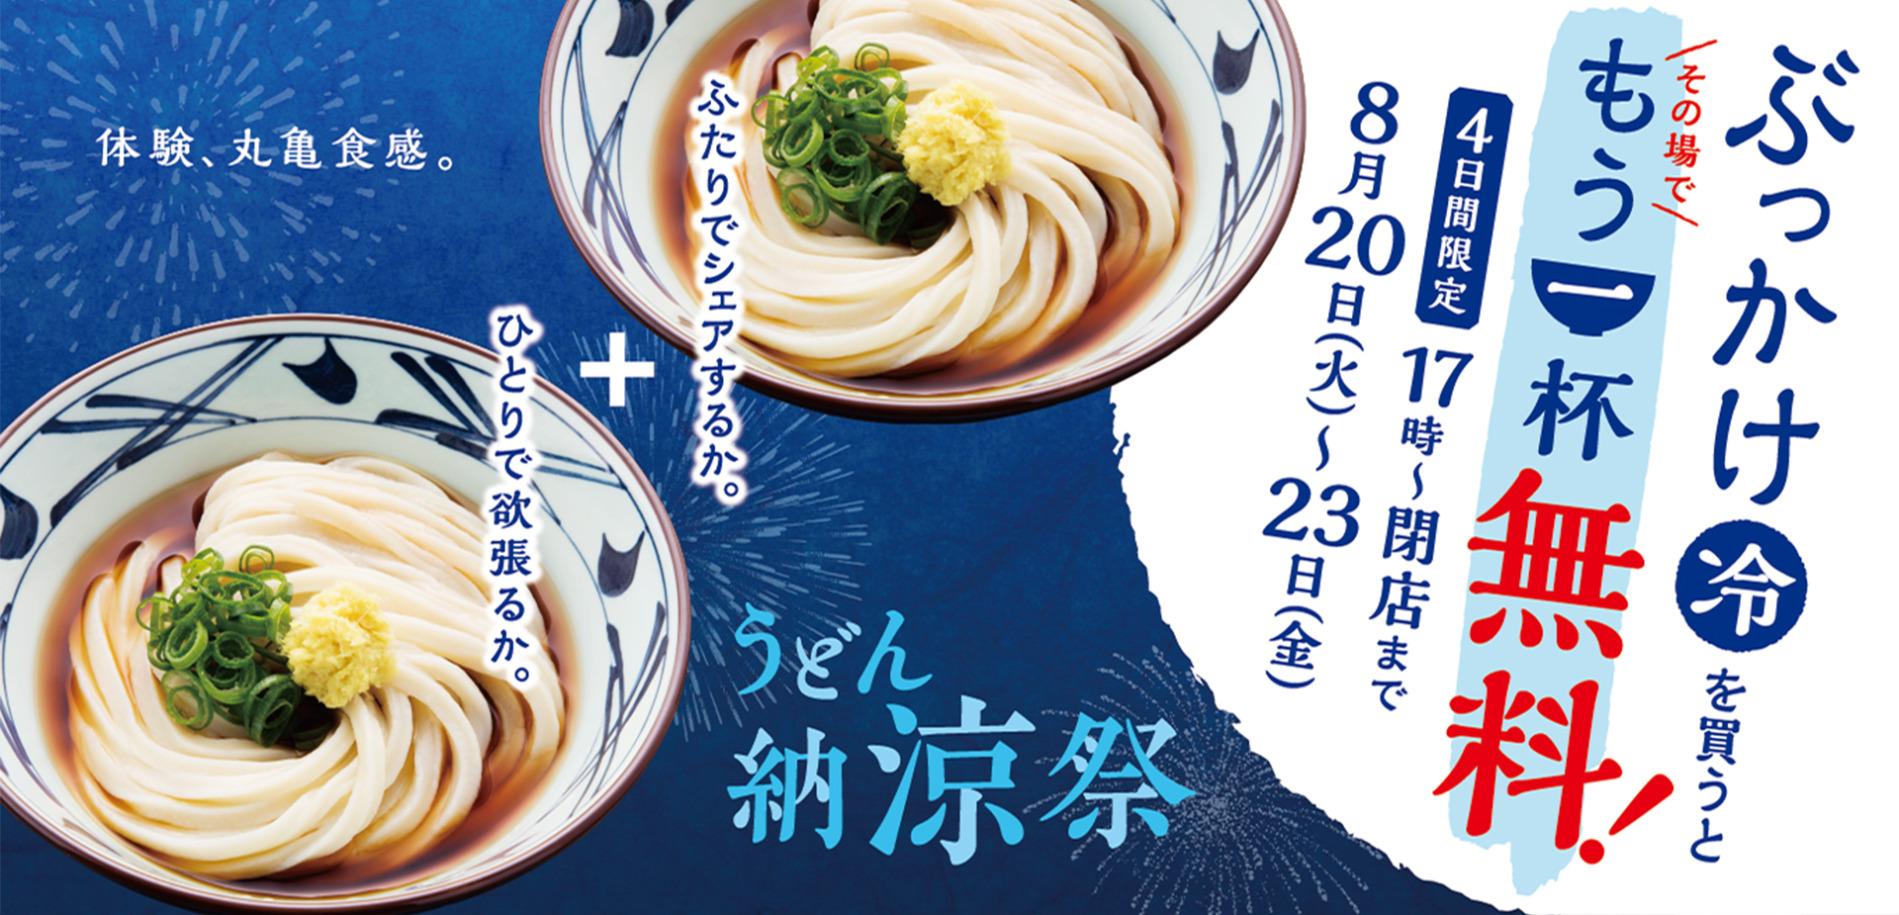 Screenshot_2019-08-21 丸亀製麺 うどん納涼祭